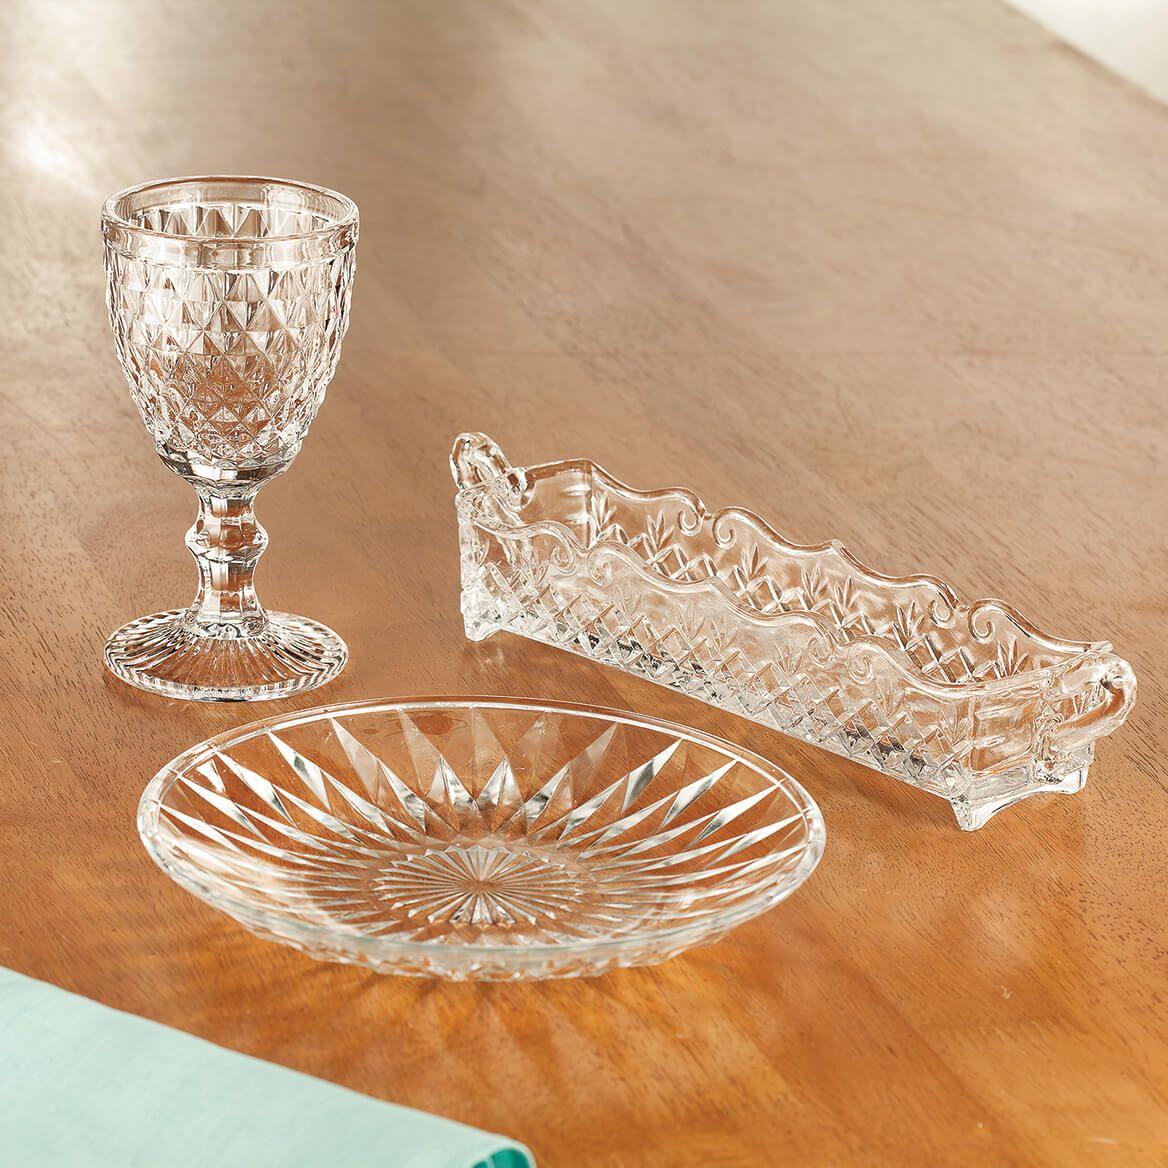 William Roberts Diamond Wine Glasses, Set of 4-367559